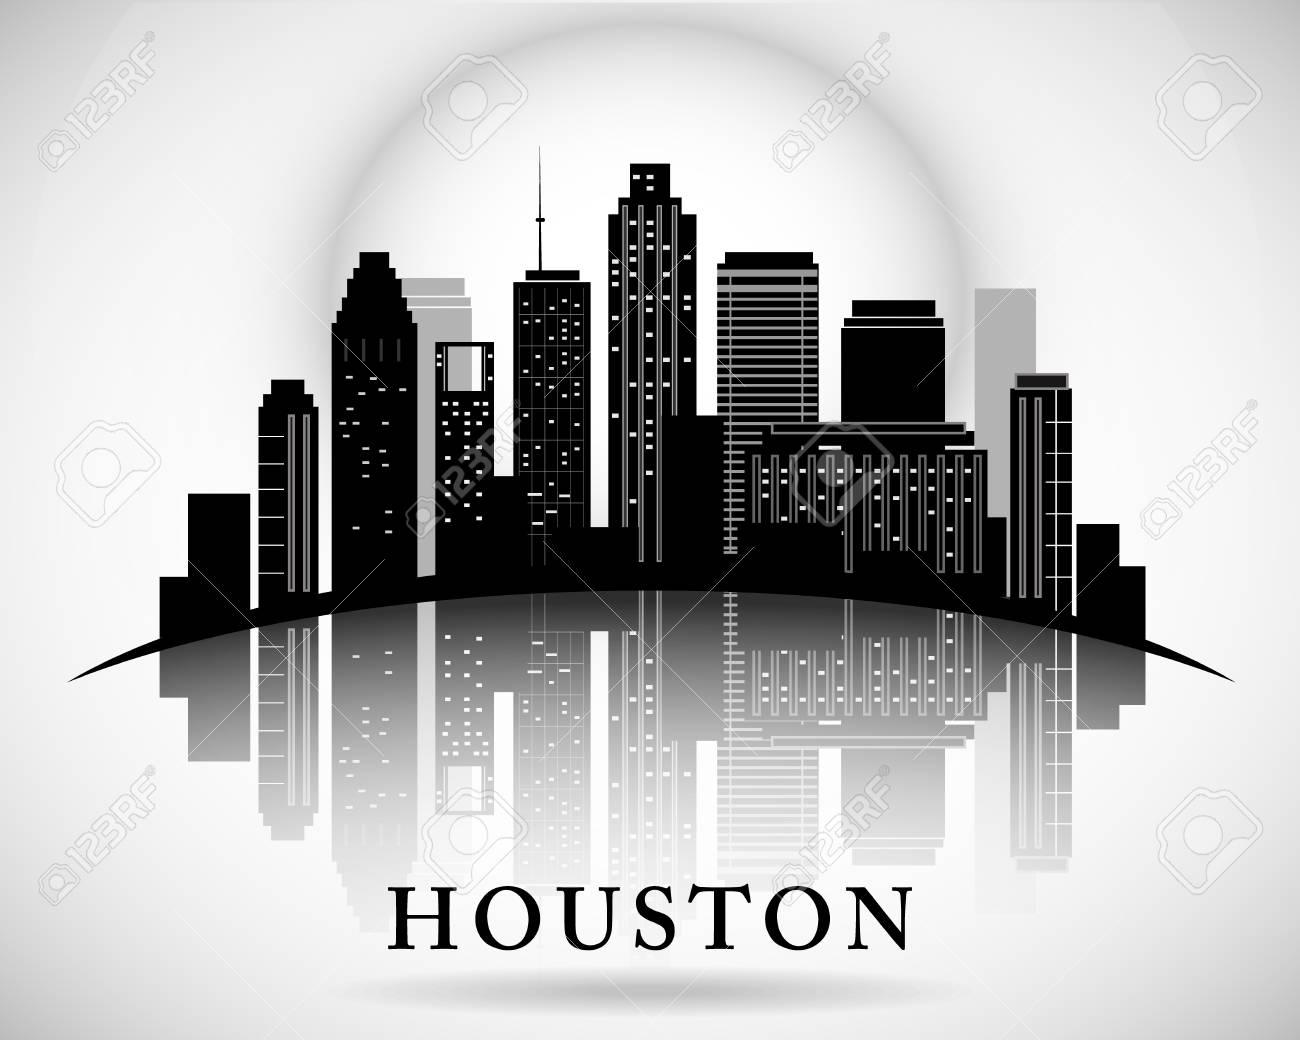 Houston Texas Skyline City Silhouette Royalty Free Cliparts